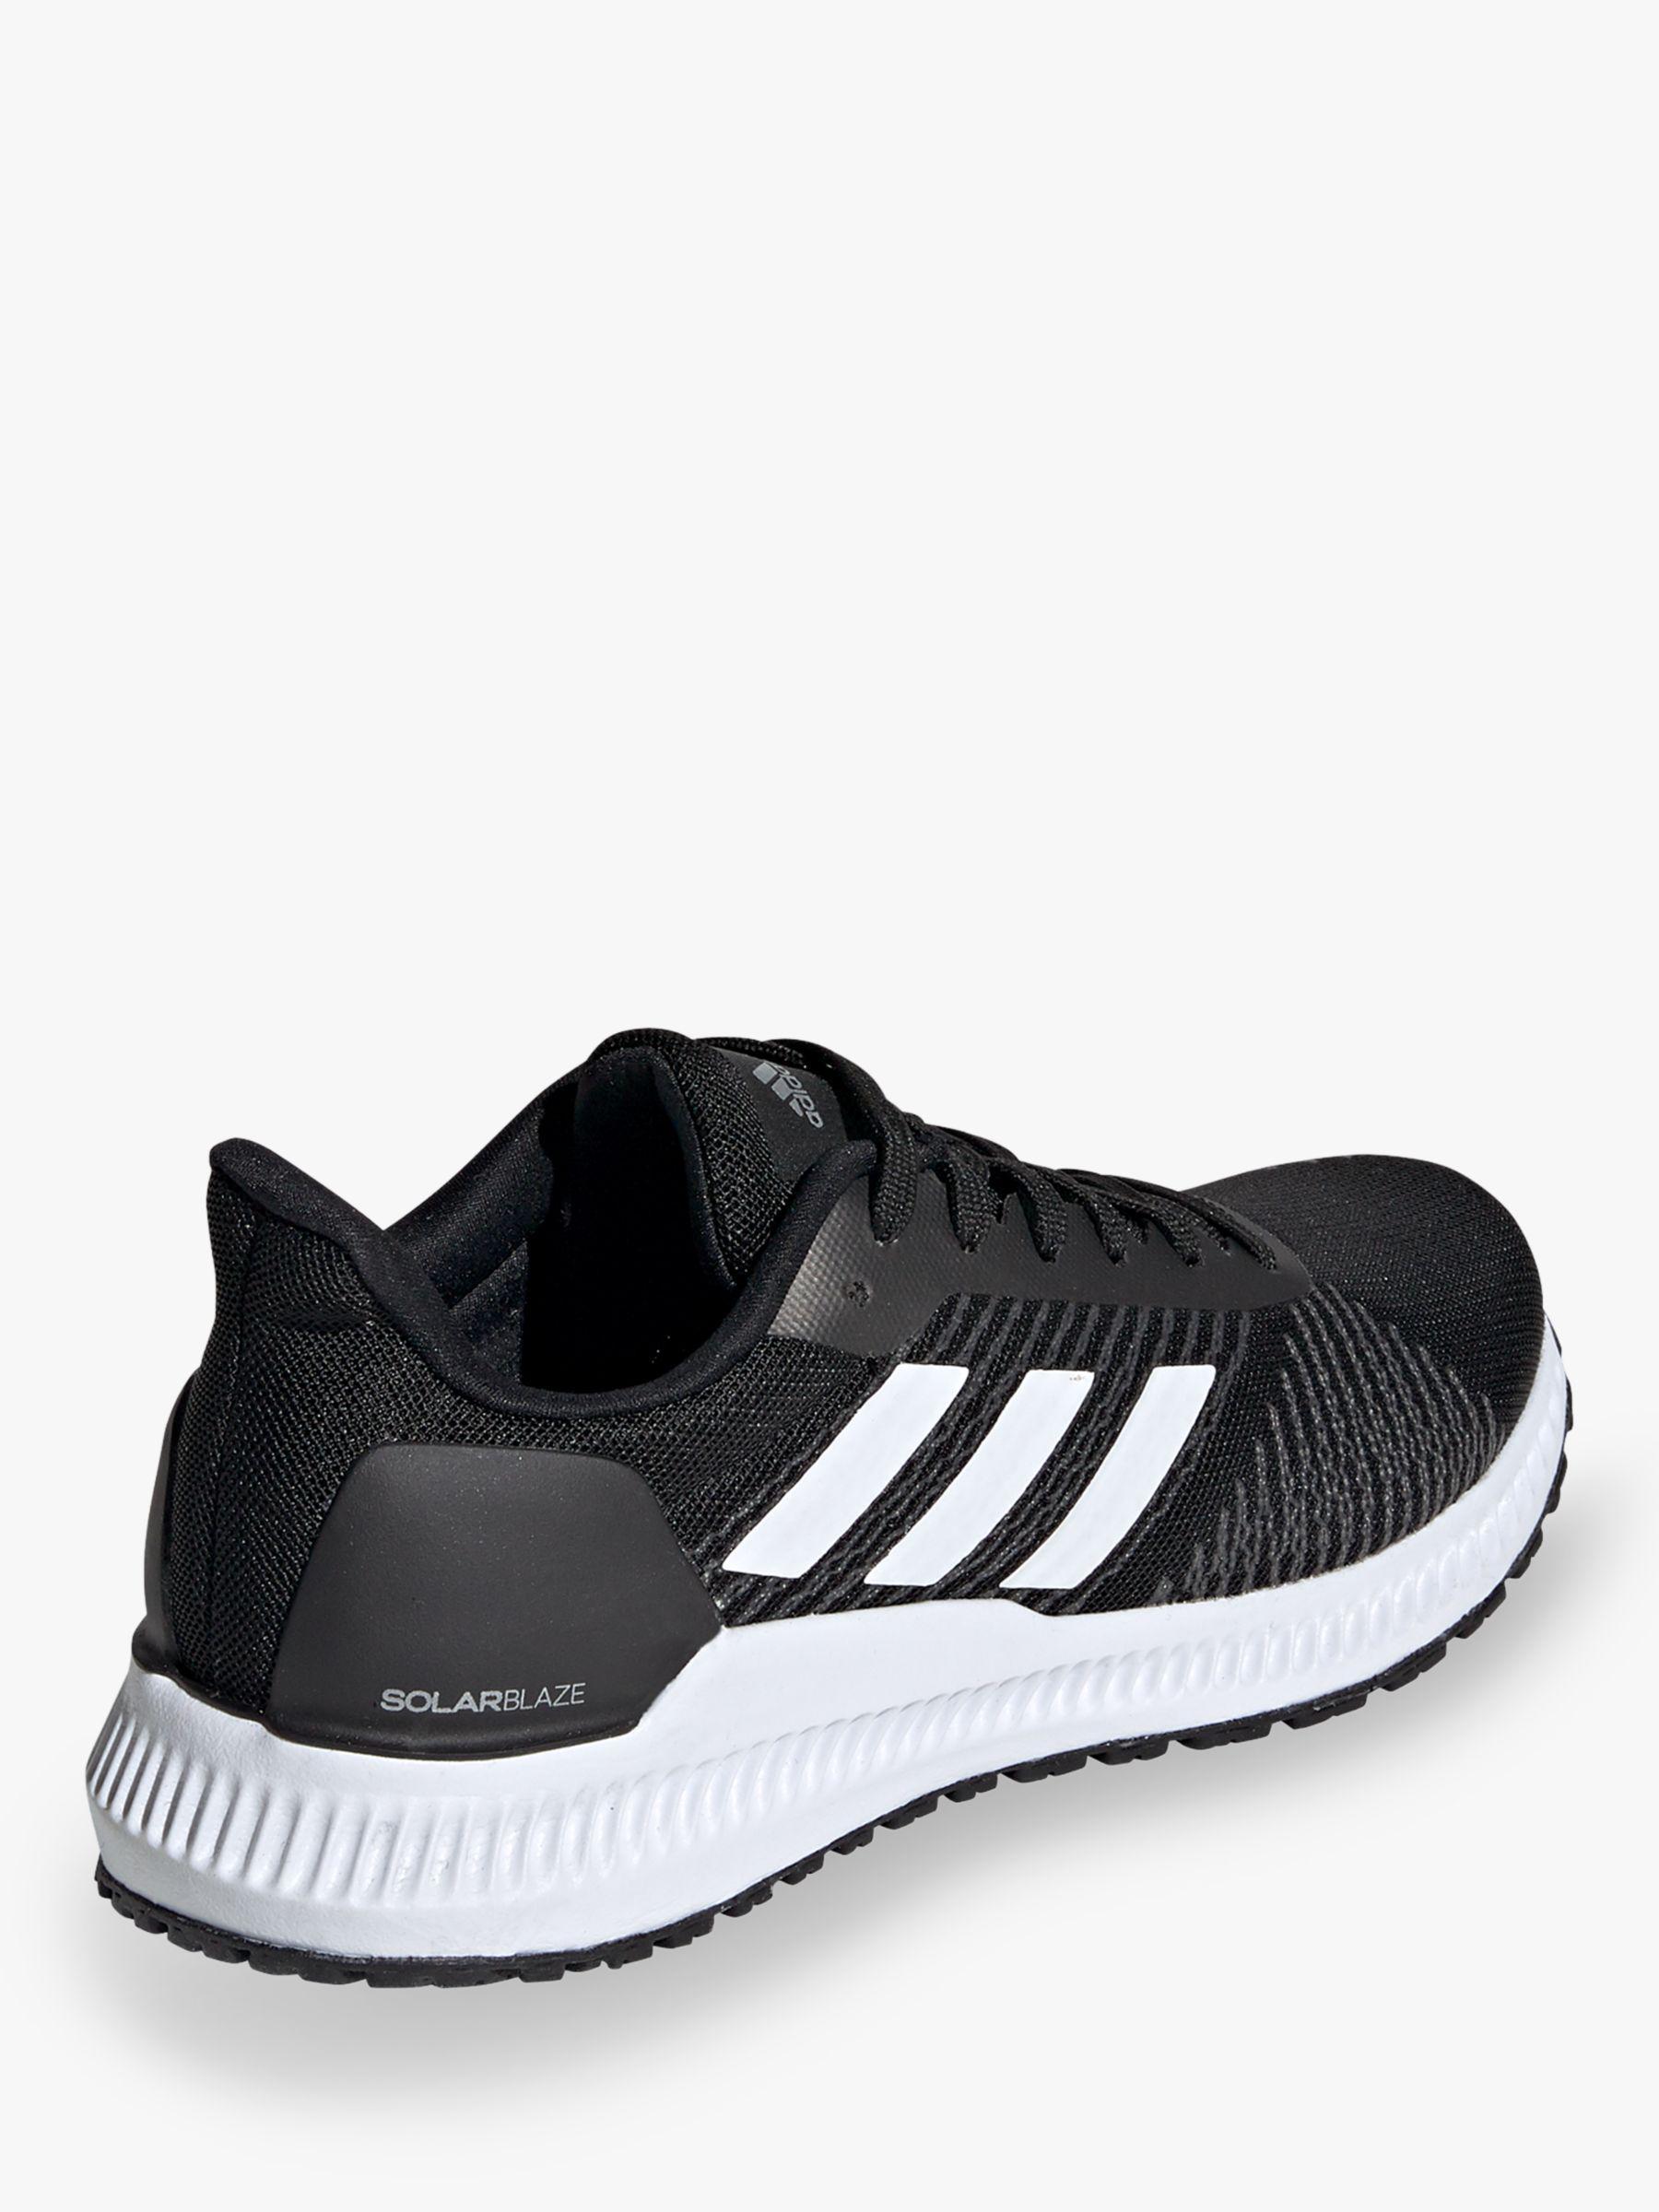 1aad9f2d822 Adidas - Black Solar Blaze Women s Running Shoes - Lyst. View fullscreen